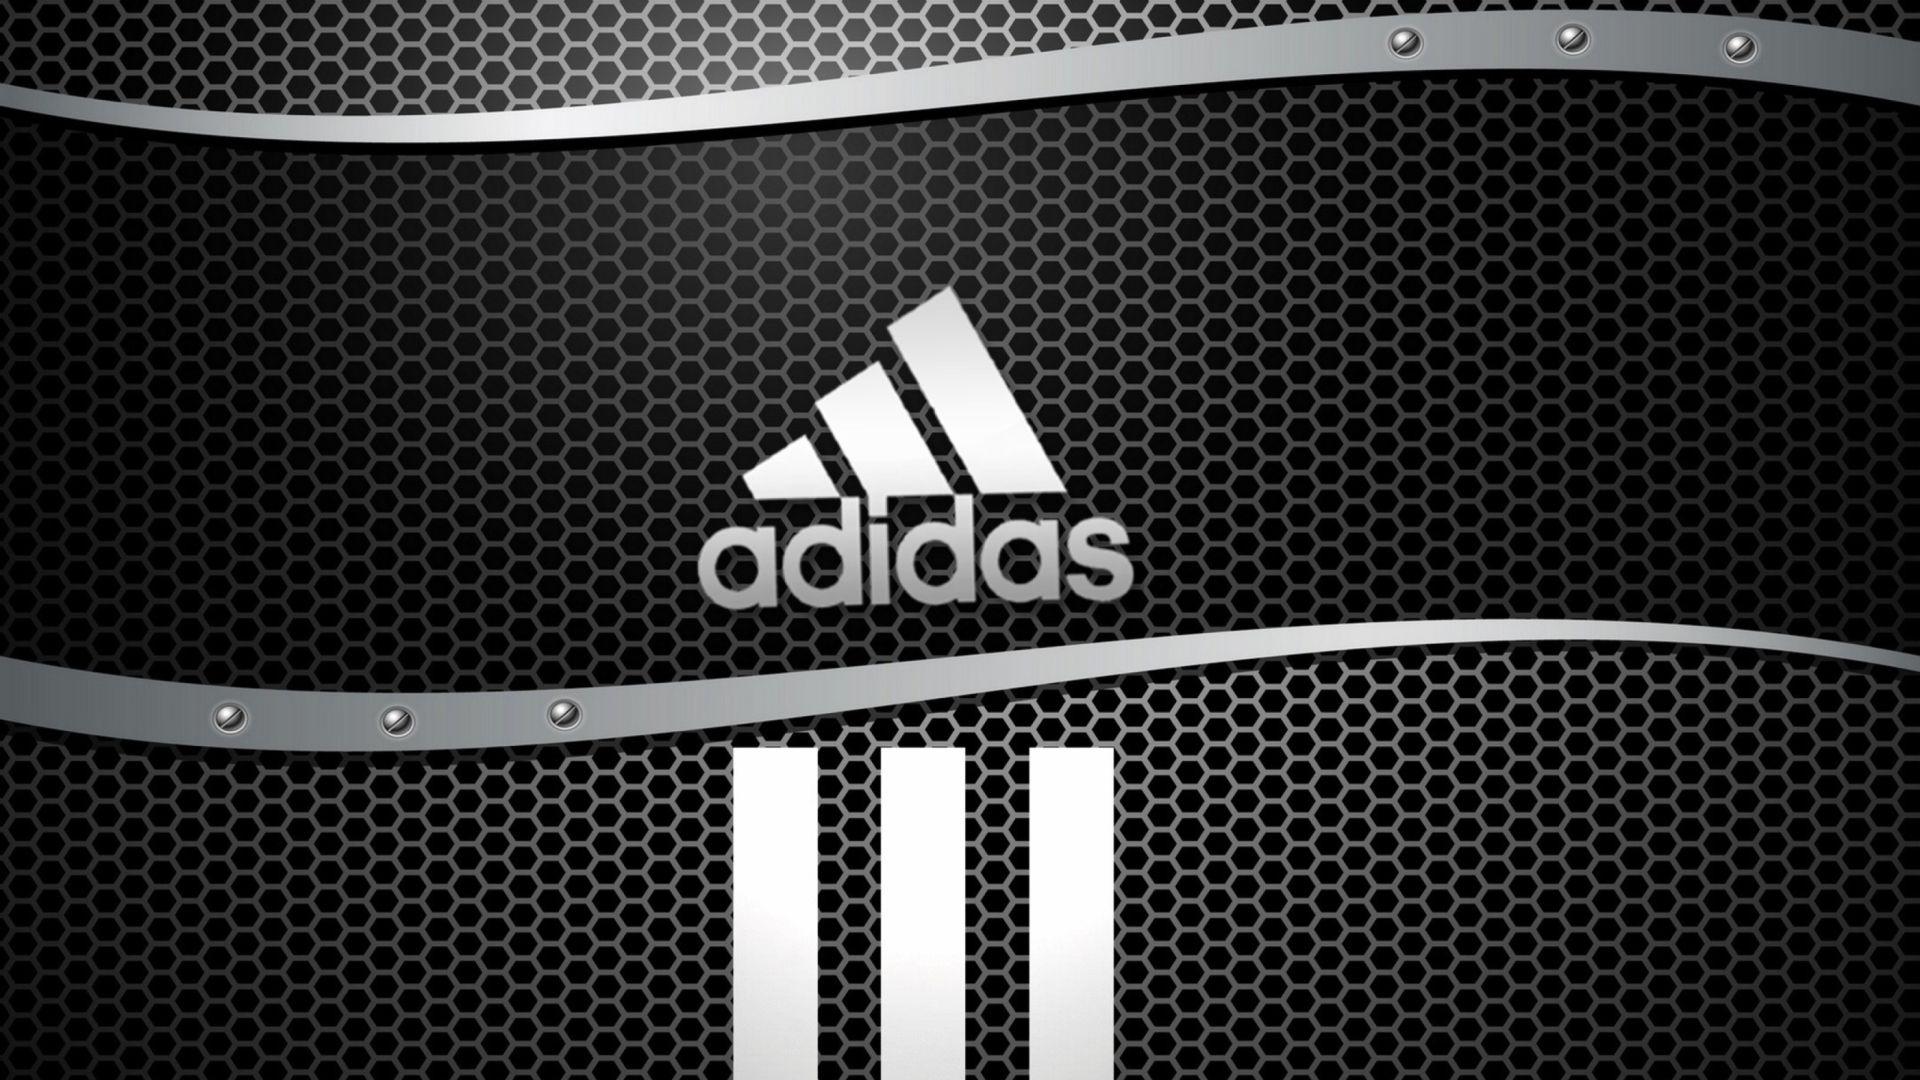 Wallpapers Smartphone Adidas 1